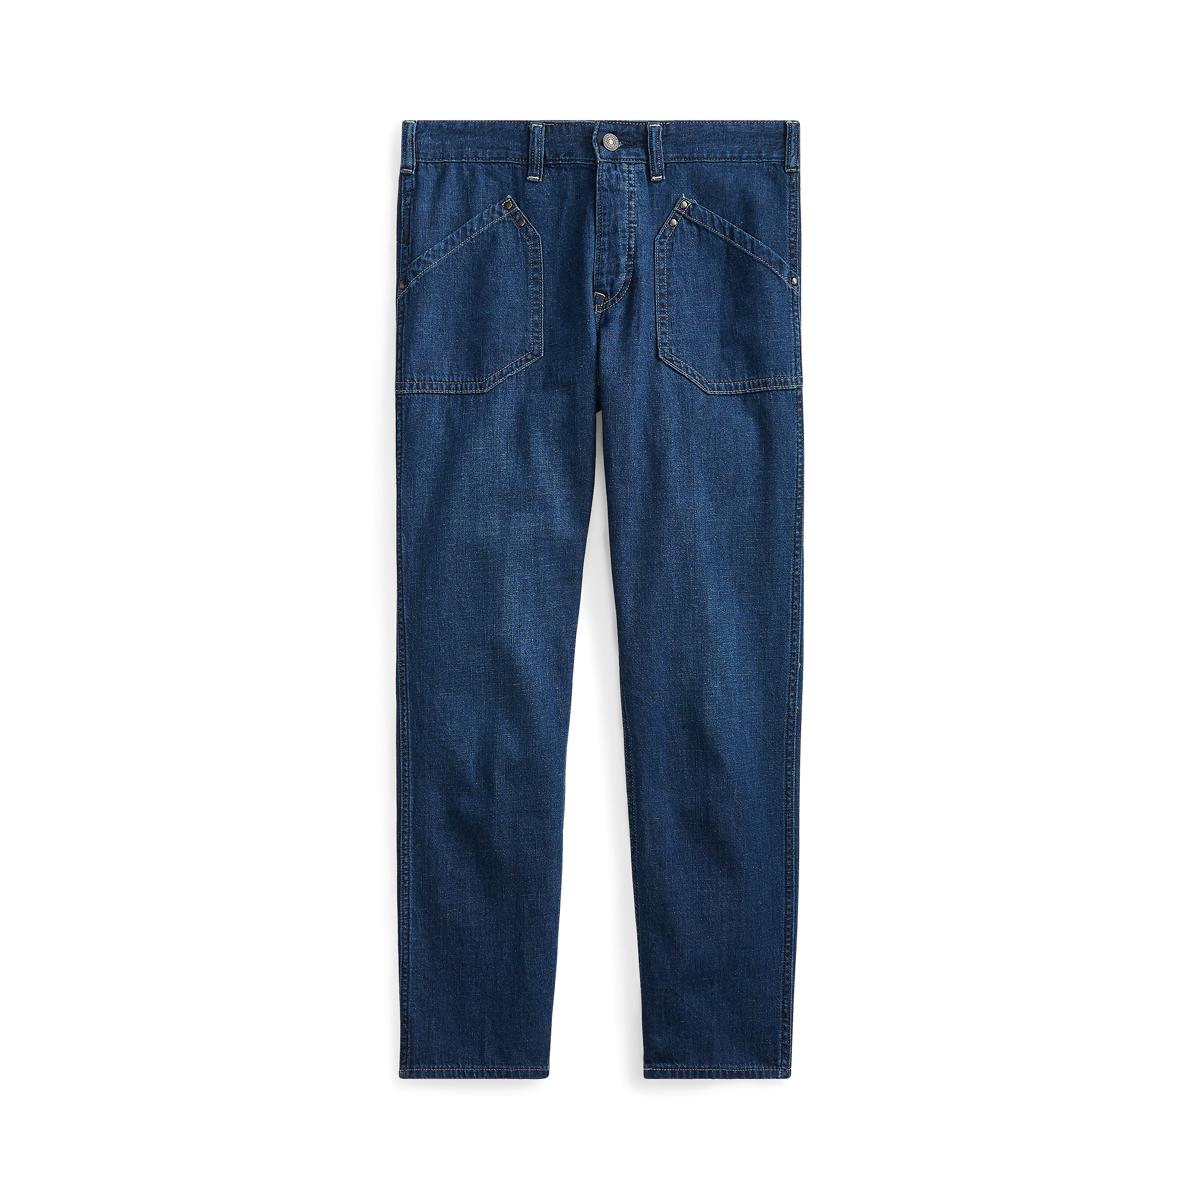 caf4e1ca4 Workwear Denim Skinny Jean